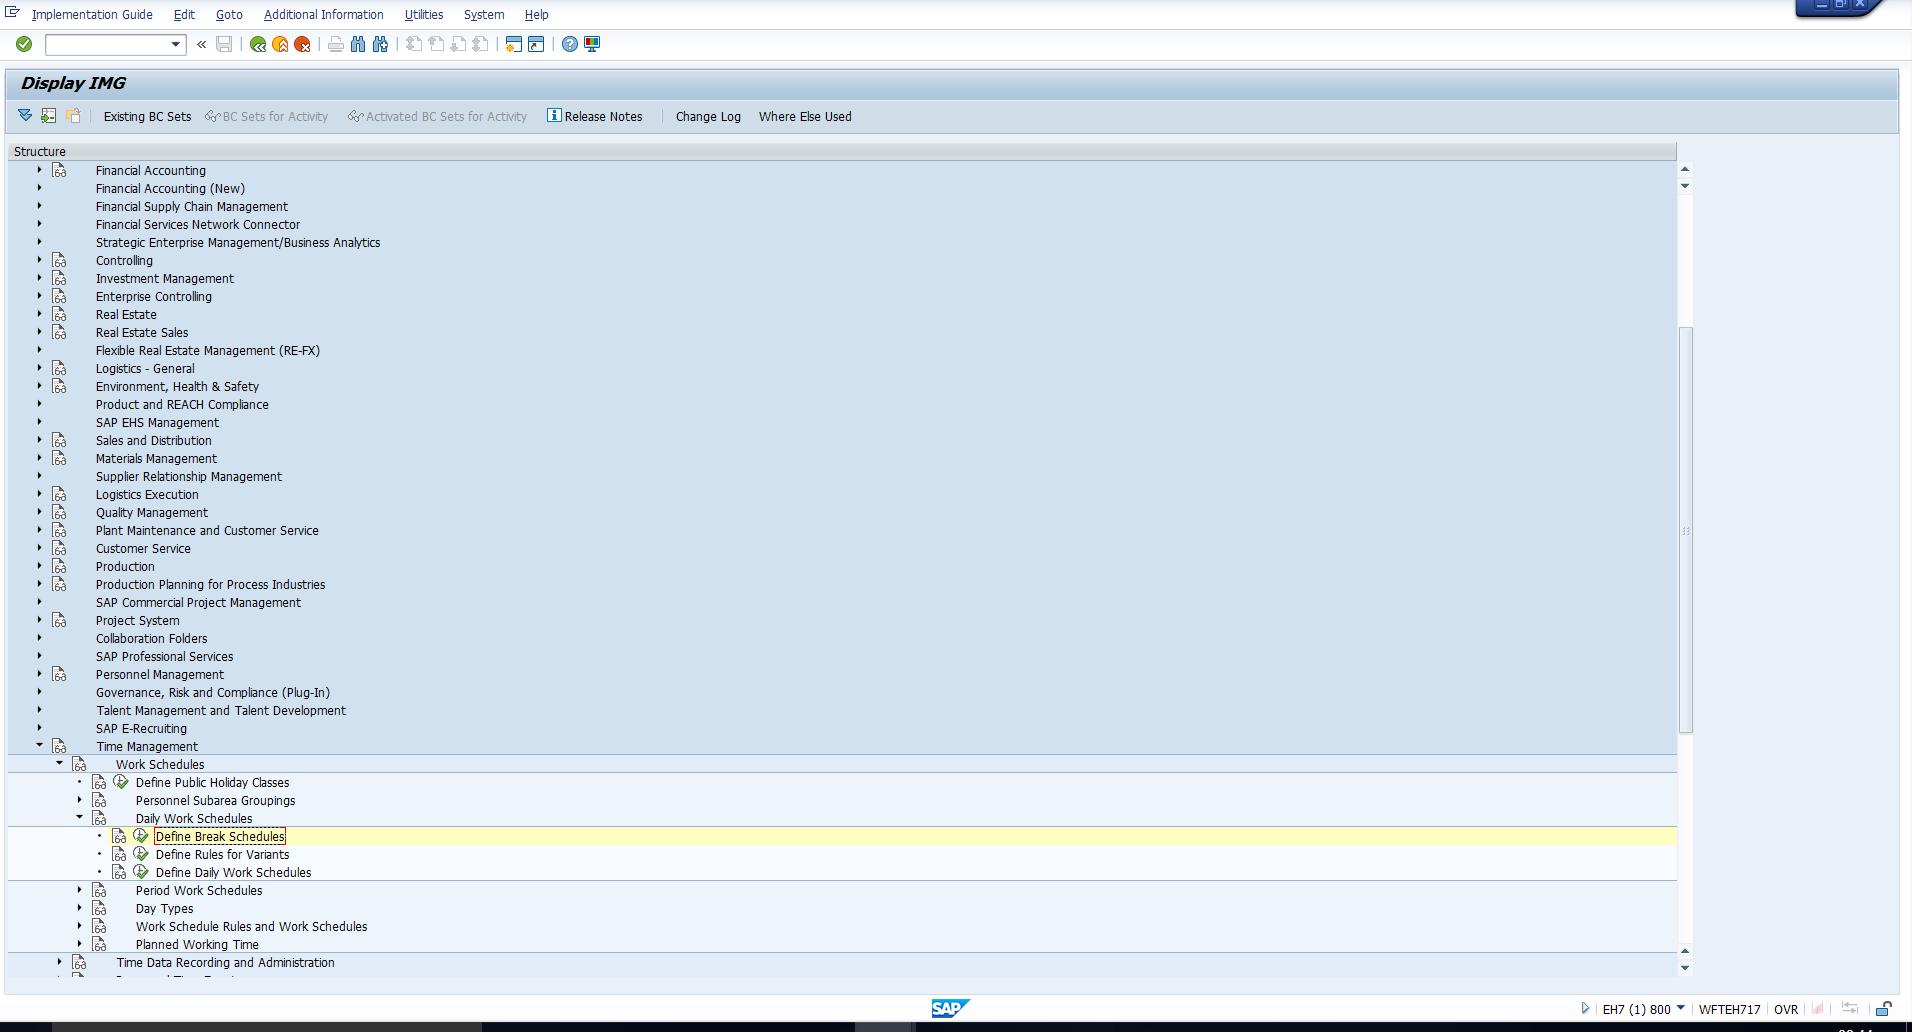 Figure 5: IMG Path to Configure SAP Break Schedules